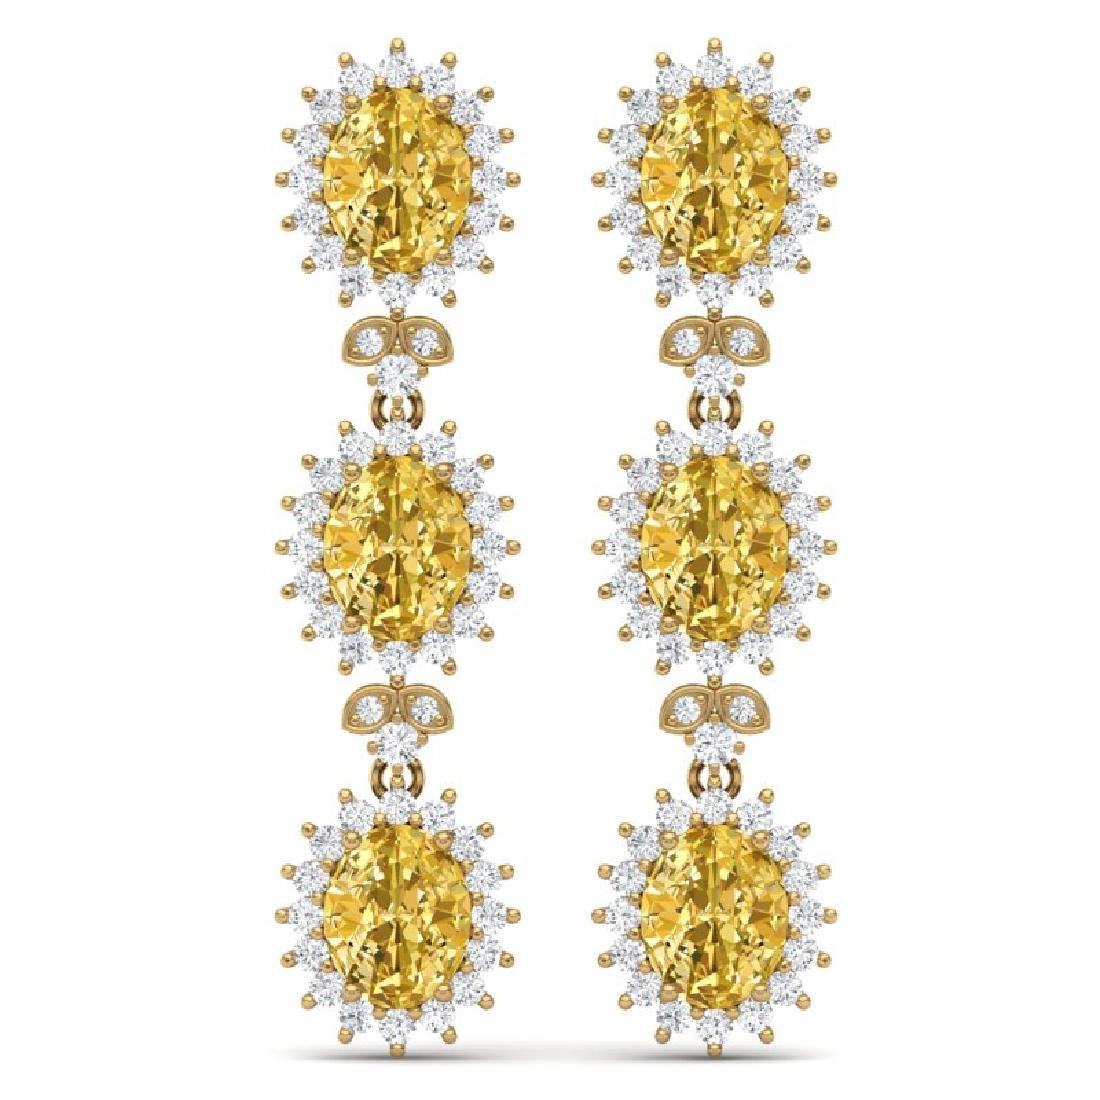 19.06 CTW Royalty Canary Citrine & VS Diamond Earrings